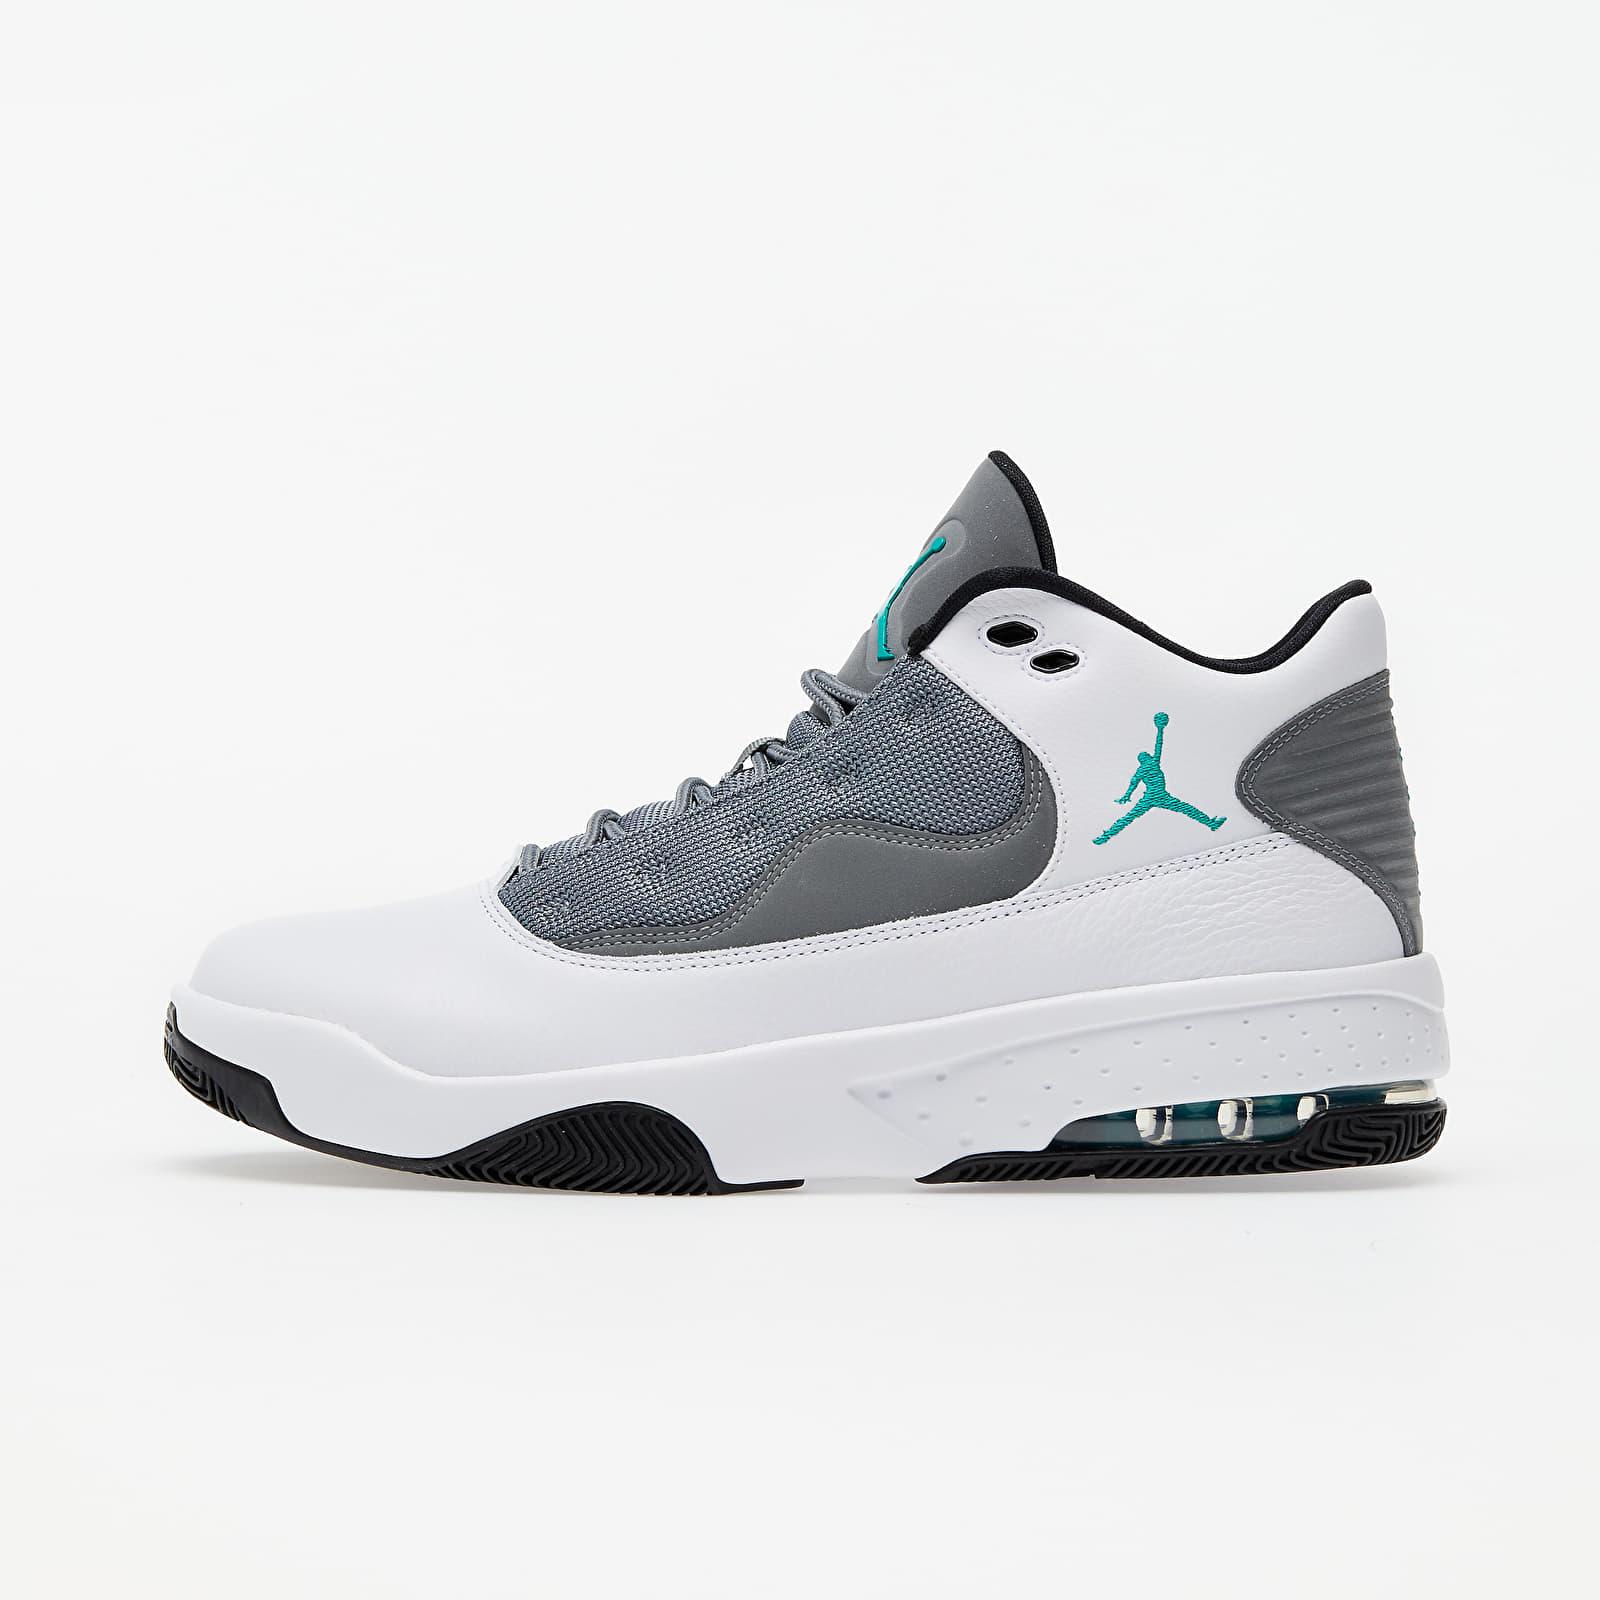 Jordan Max Aura 2 White/ Black-Neptune Green-Smoke Grey | Footshop